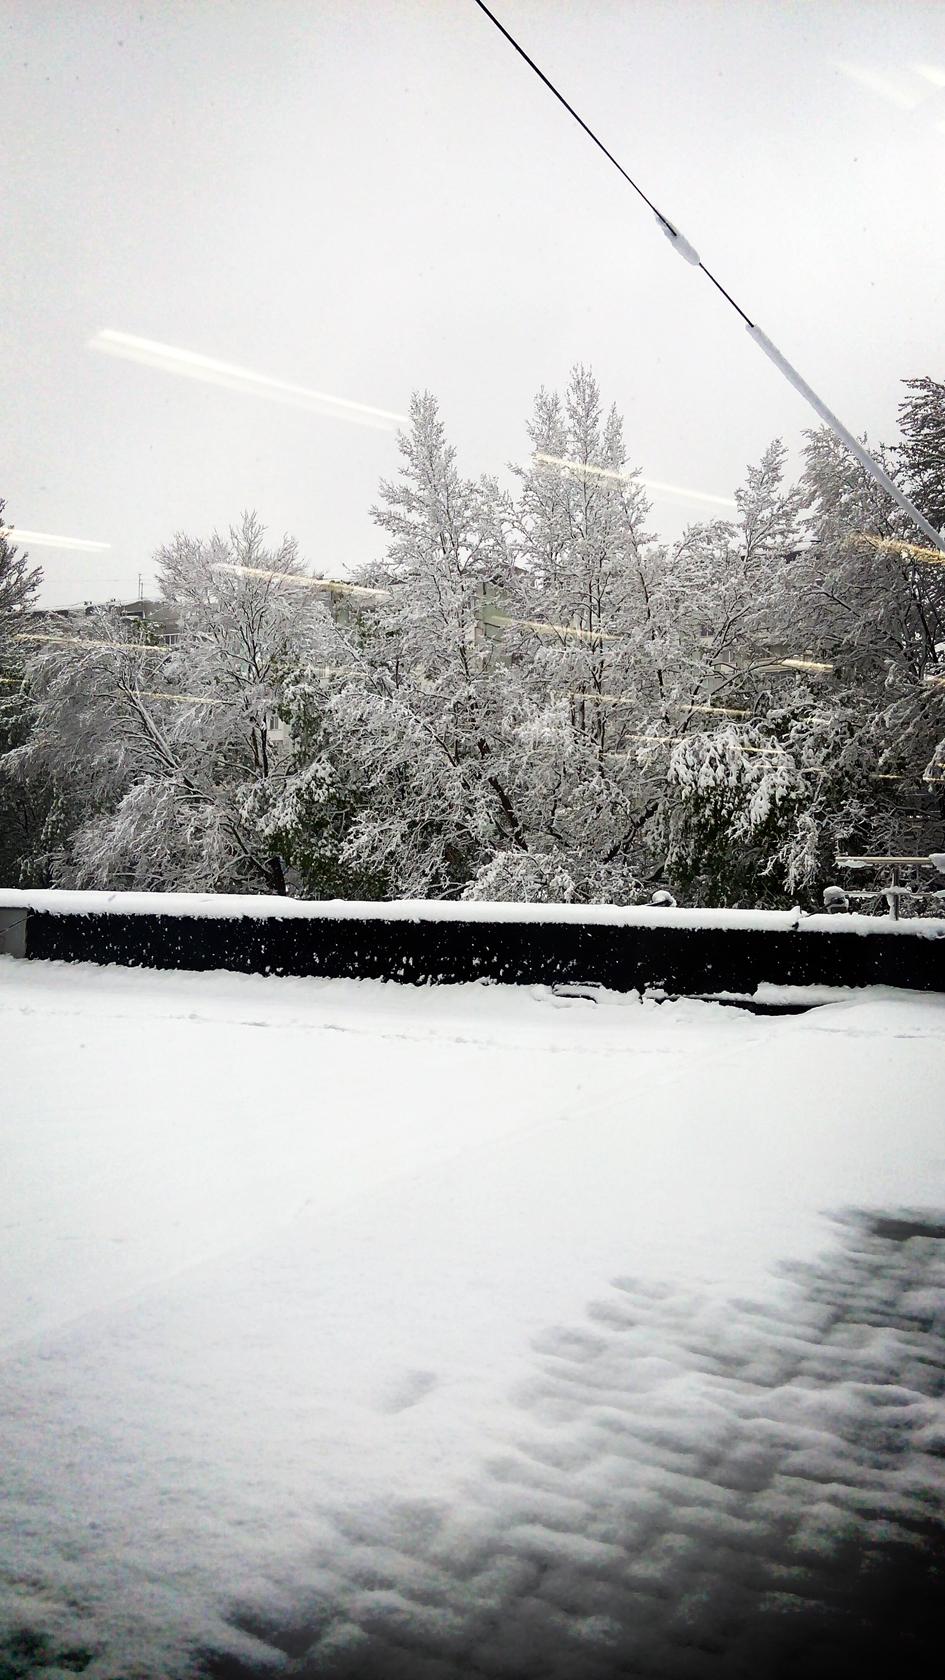 april snow in chisinau (19)